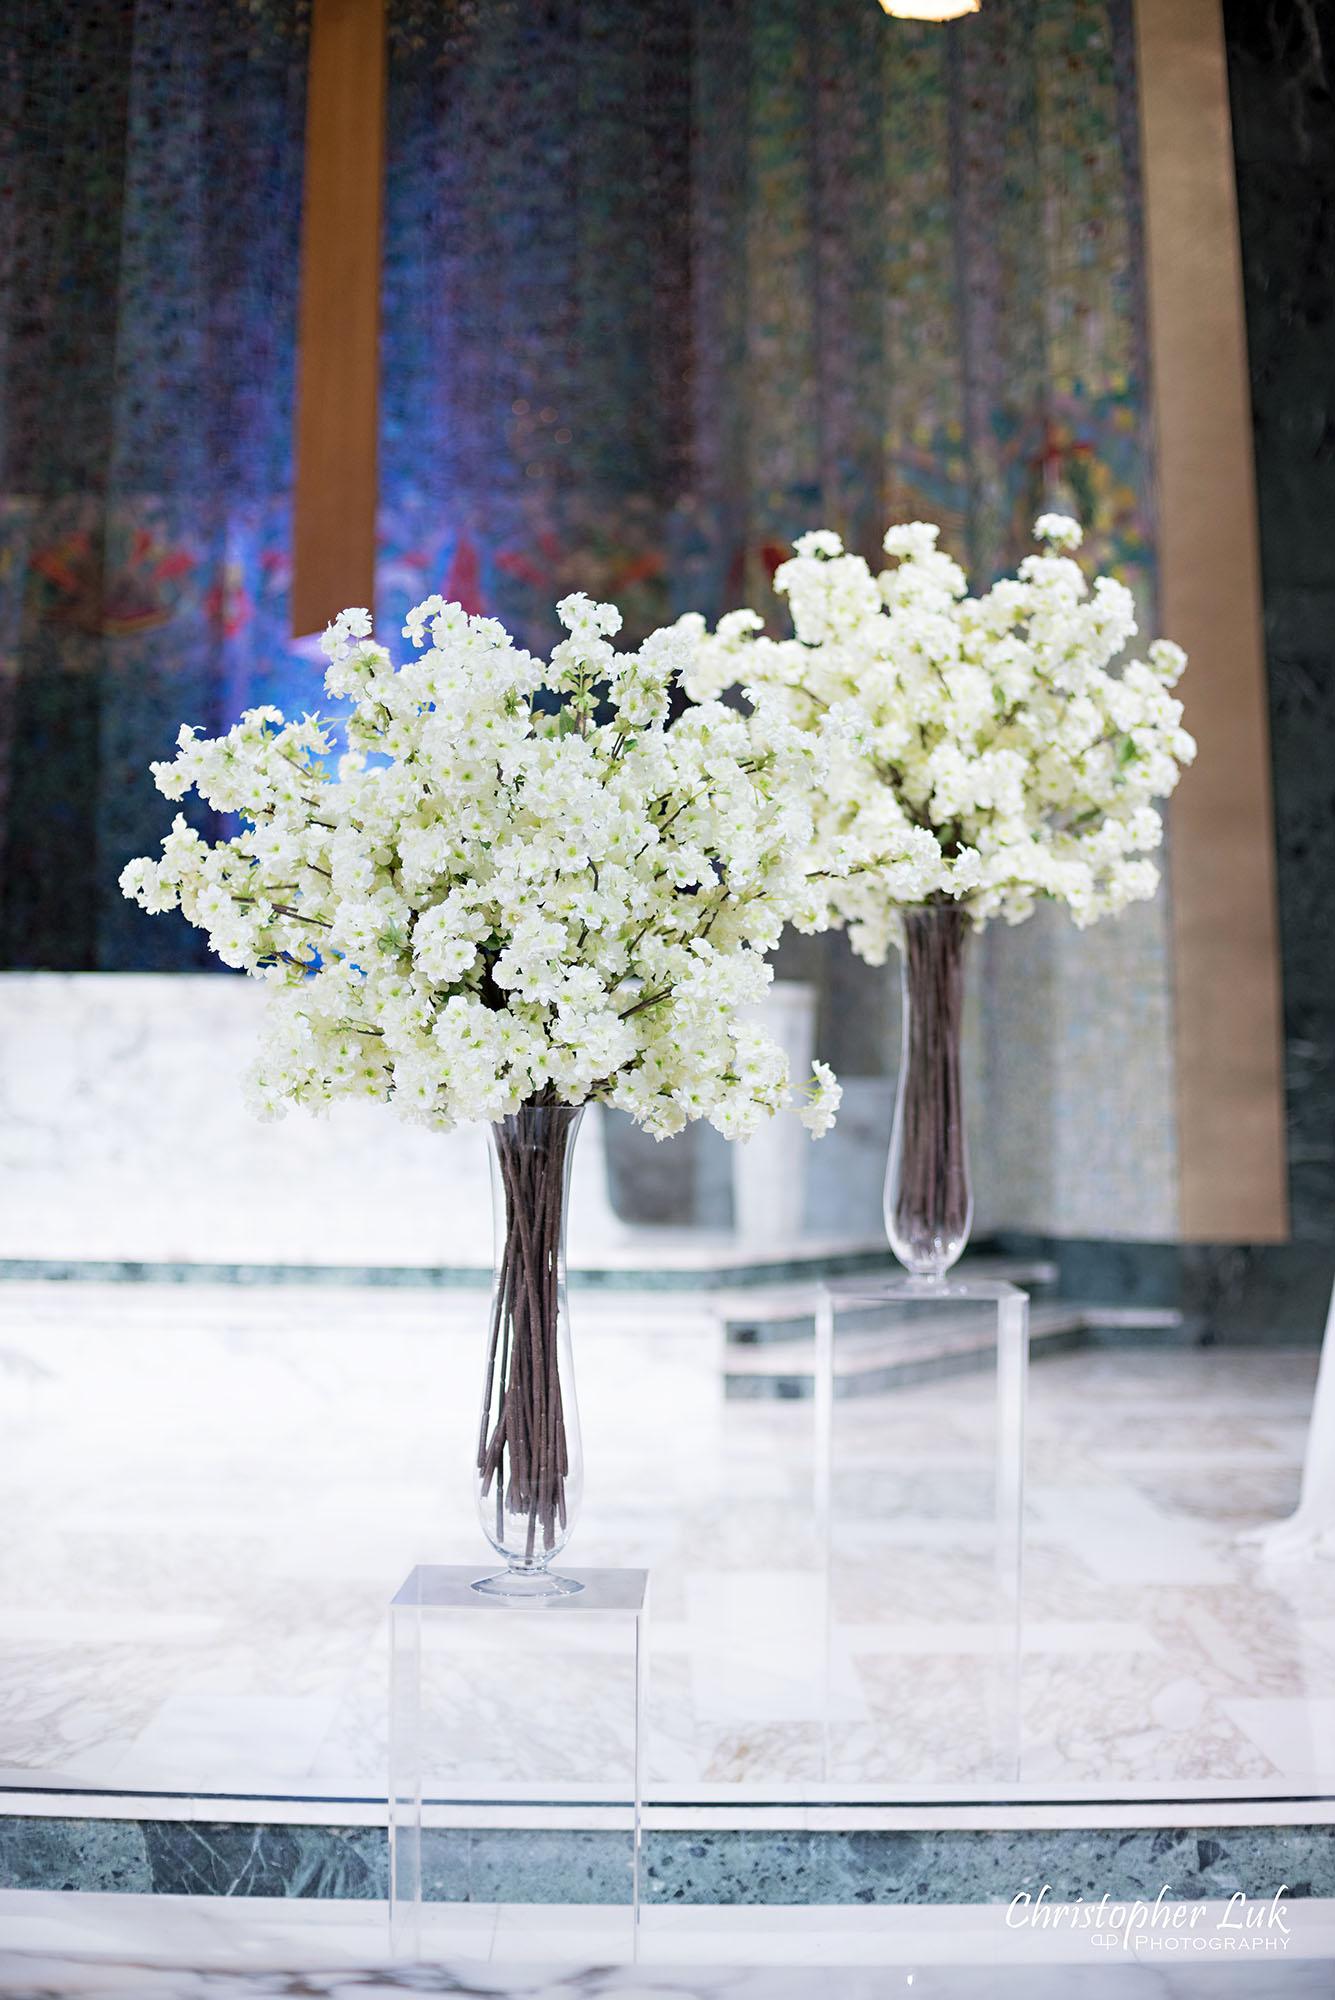 Christopher Luk Toronto Wedding Photography Tyndale Chapel Church Ceremony Venue Location Altar Floral Florist Detail